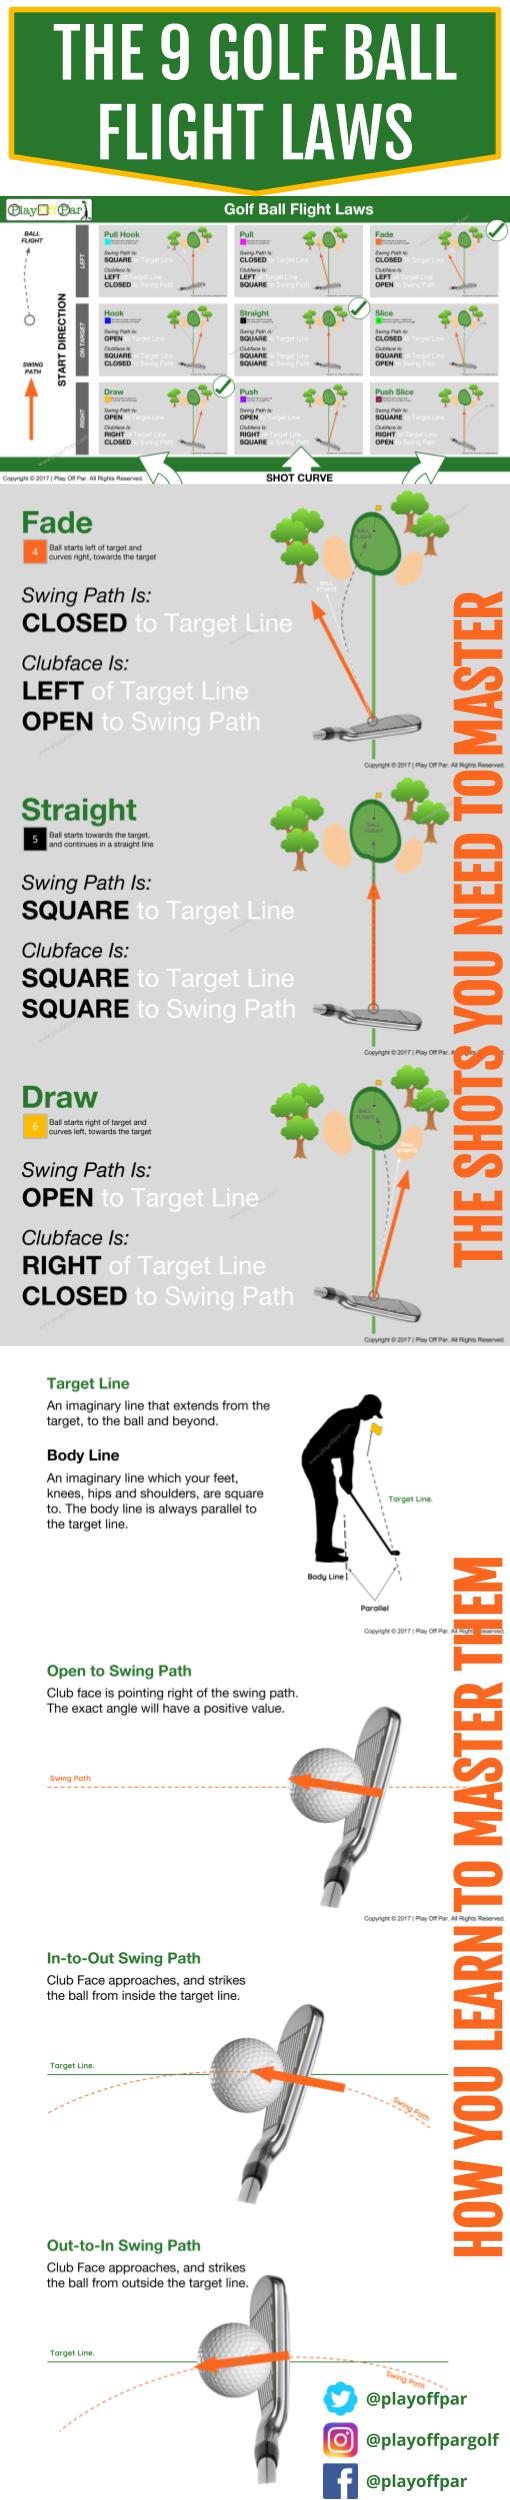 hight resolution of the golf ball flight laws learn how the golf ball flight laws can help you improve your golf golf ball flight too low golf ball flight too high